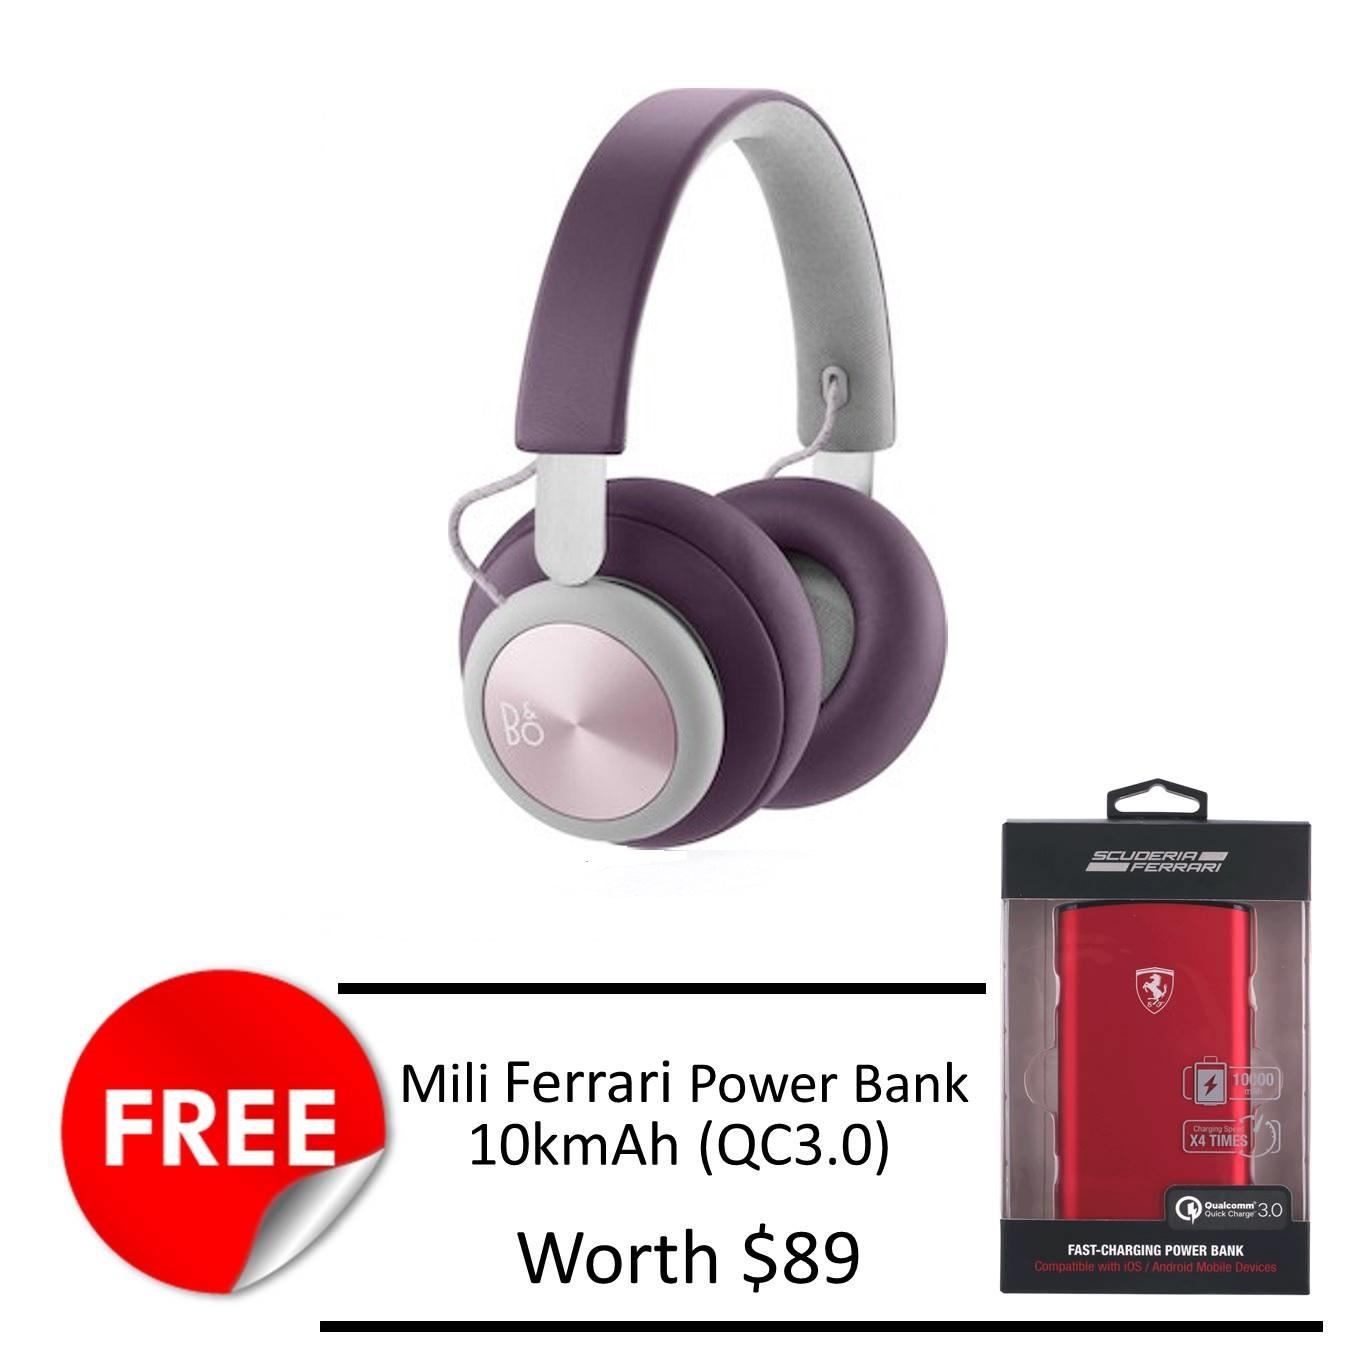 Buy B O Beoplay H4 Wireless Bluetooth Headphone Free Ferrari 10K Mah Powerbank Online